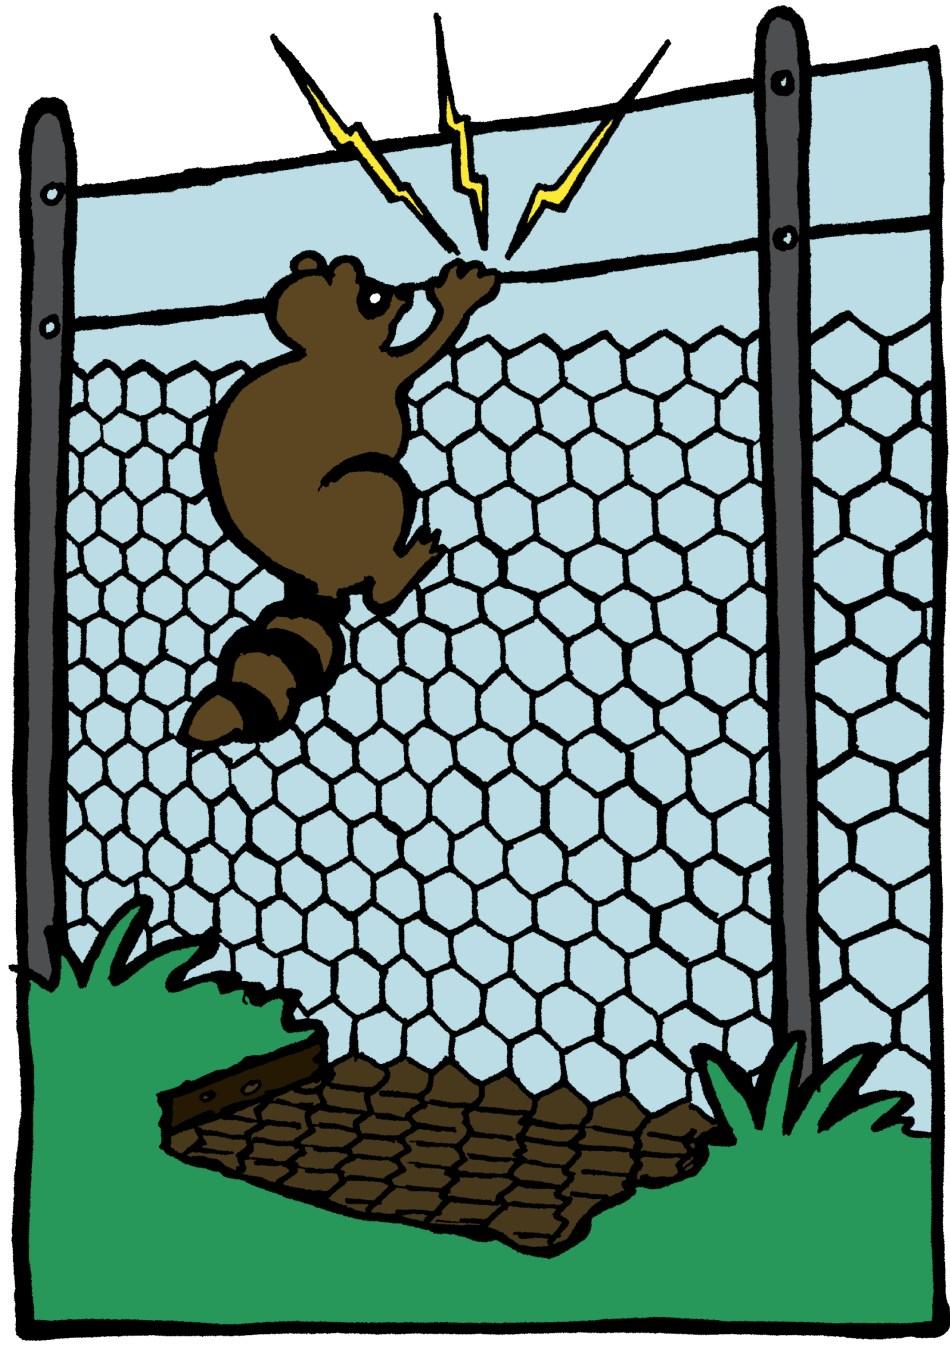 Electric raccoon fence.